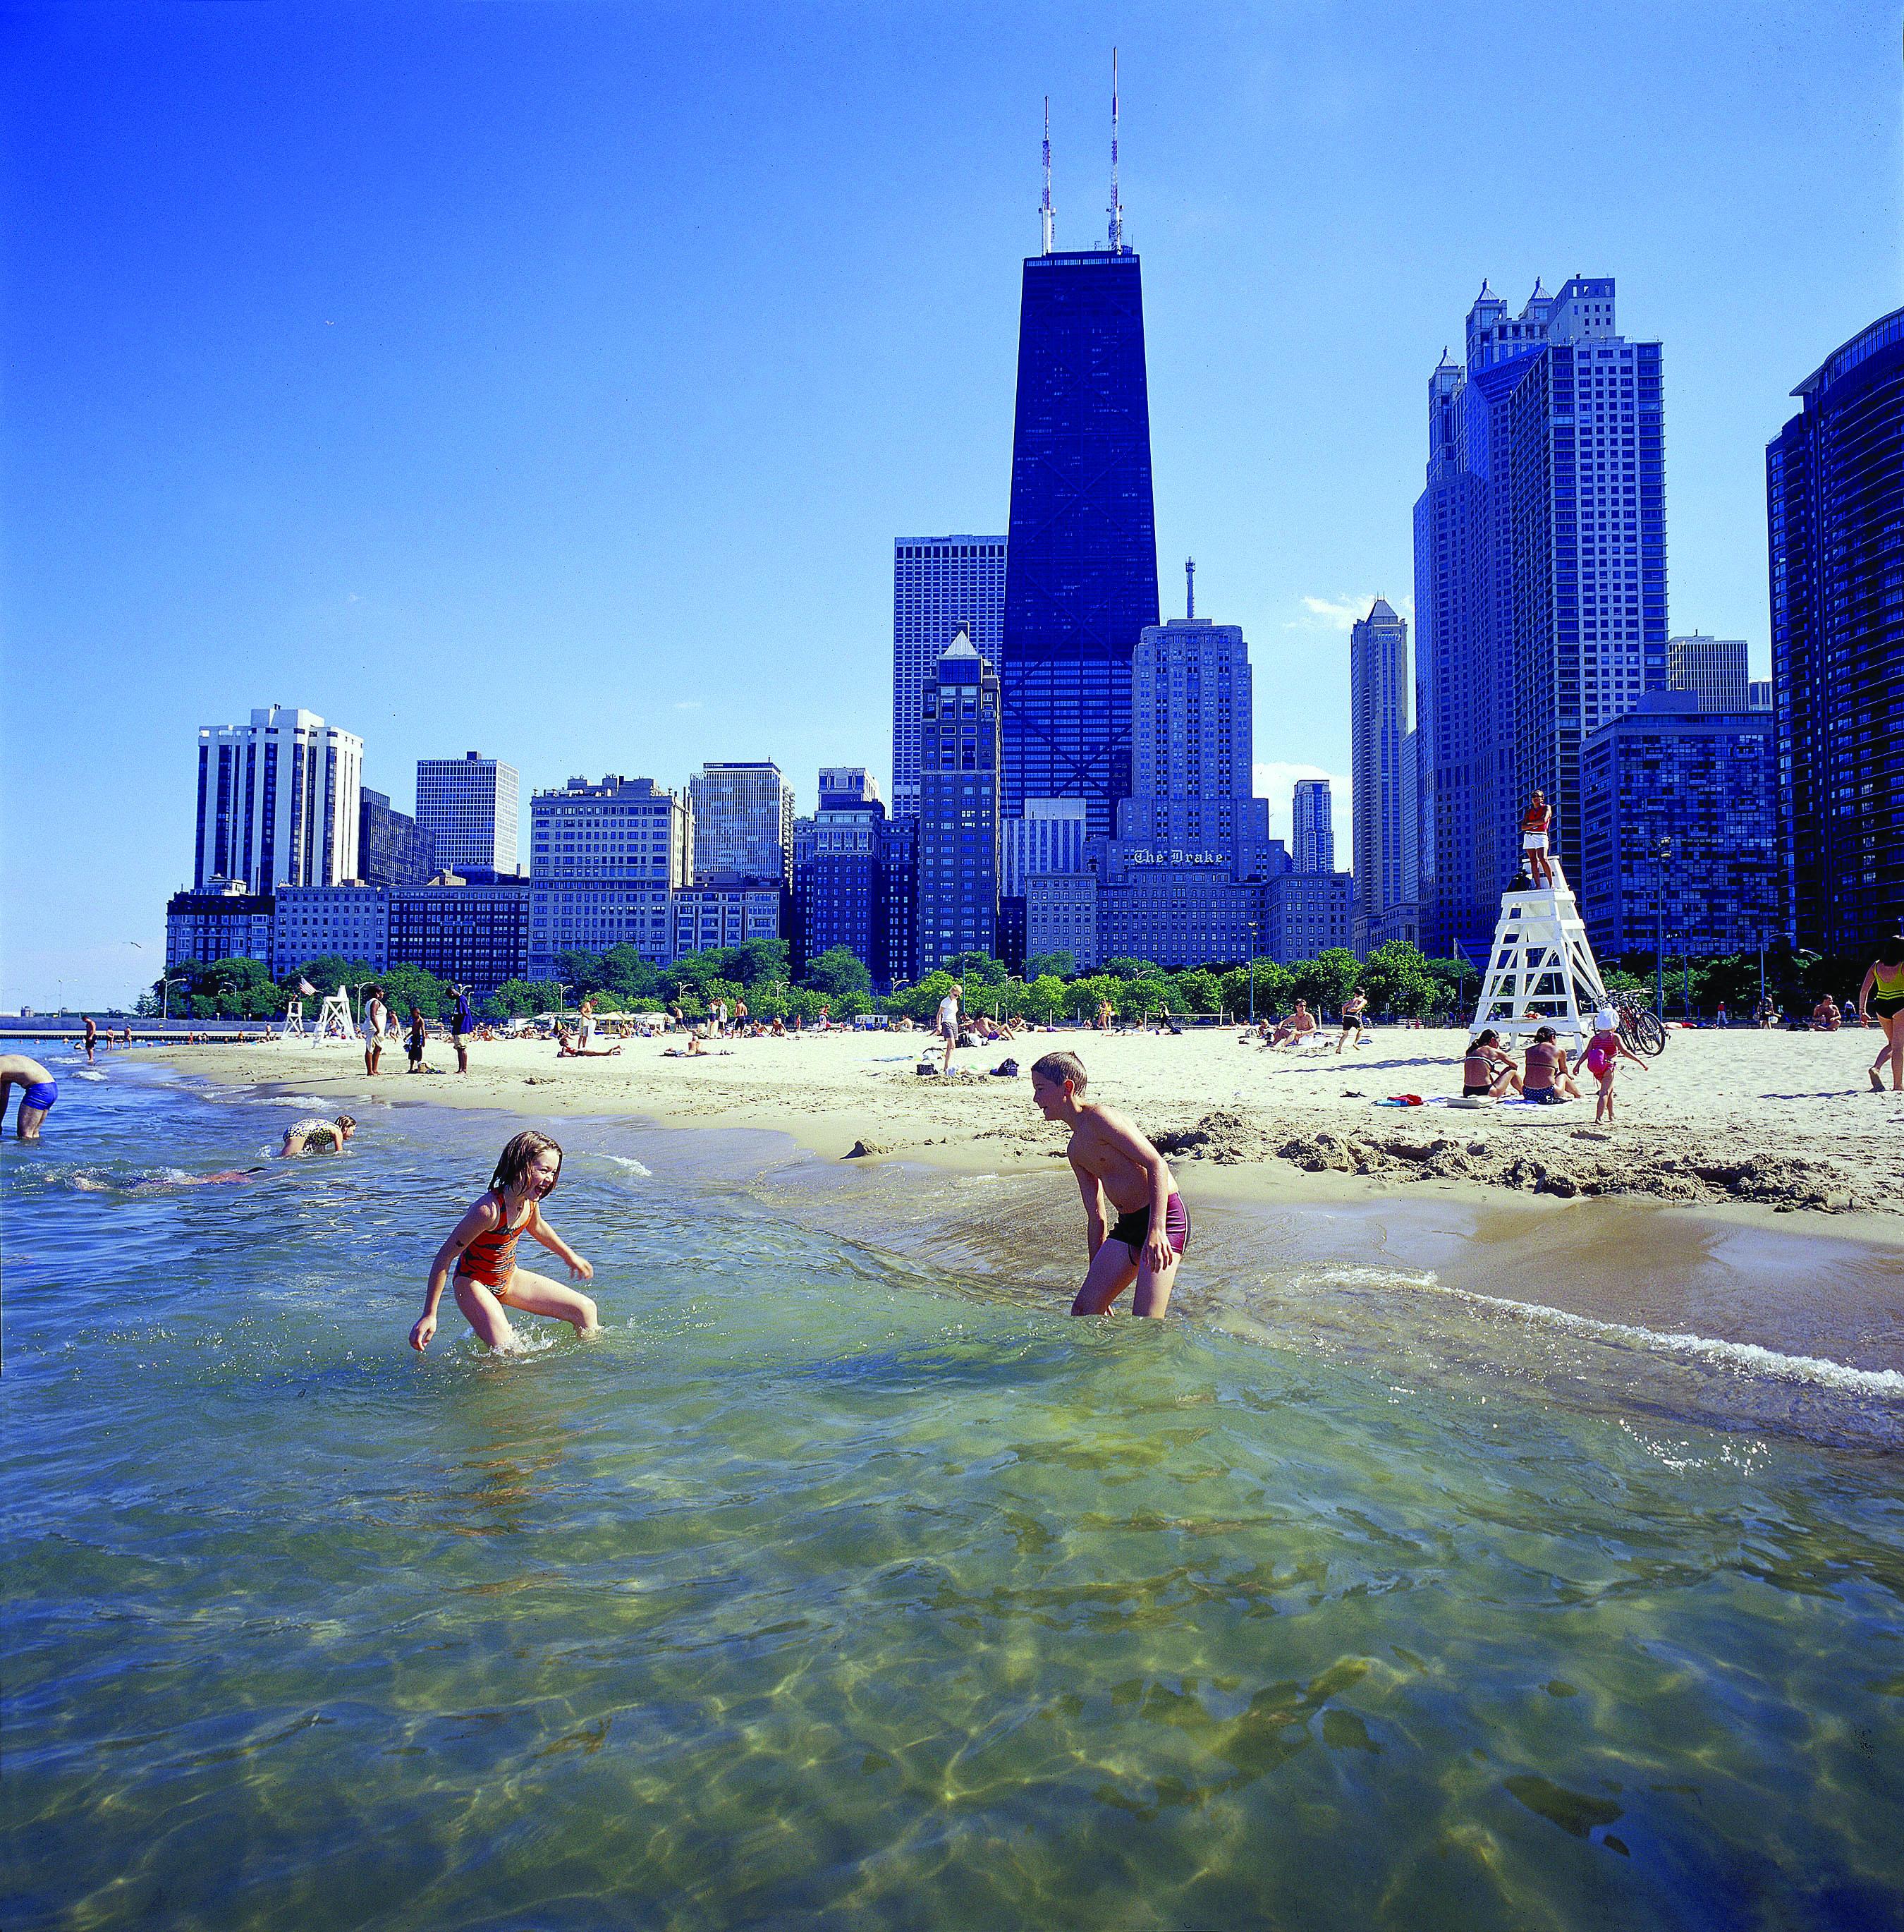 2013-08-05-ChicagoAttractions_CCTBBeachHancock22.jpg